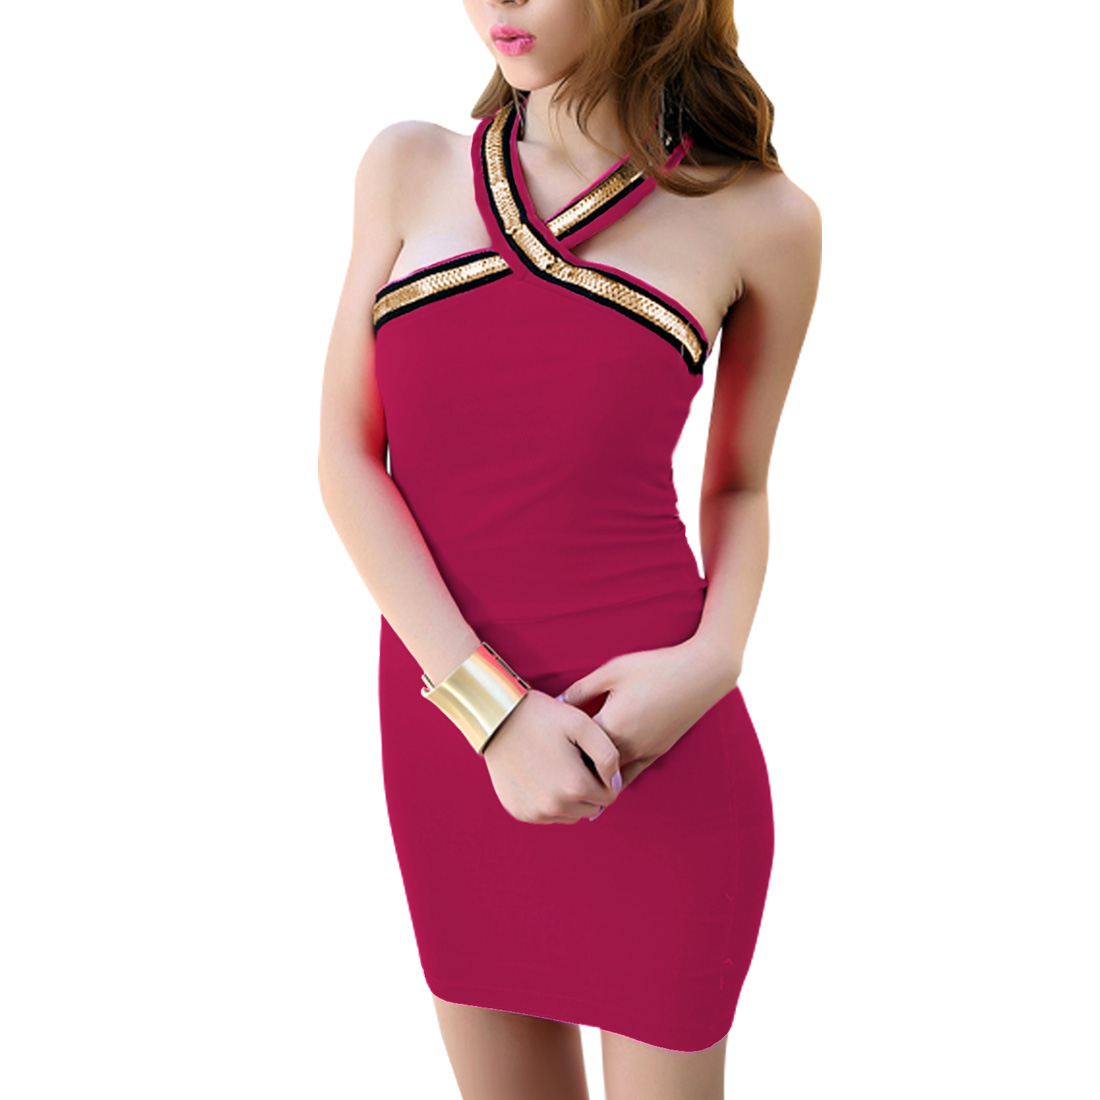 Women Club Wear Over Hip Fuchsia Halter Neck Sheath Dress XS